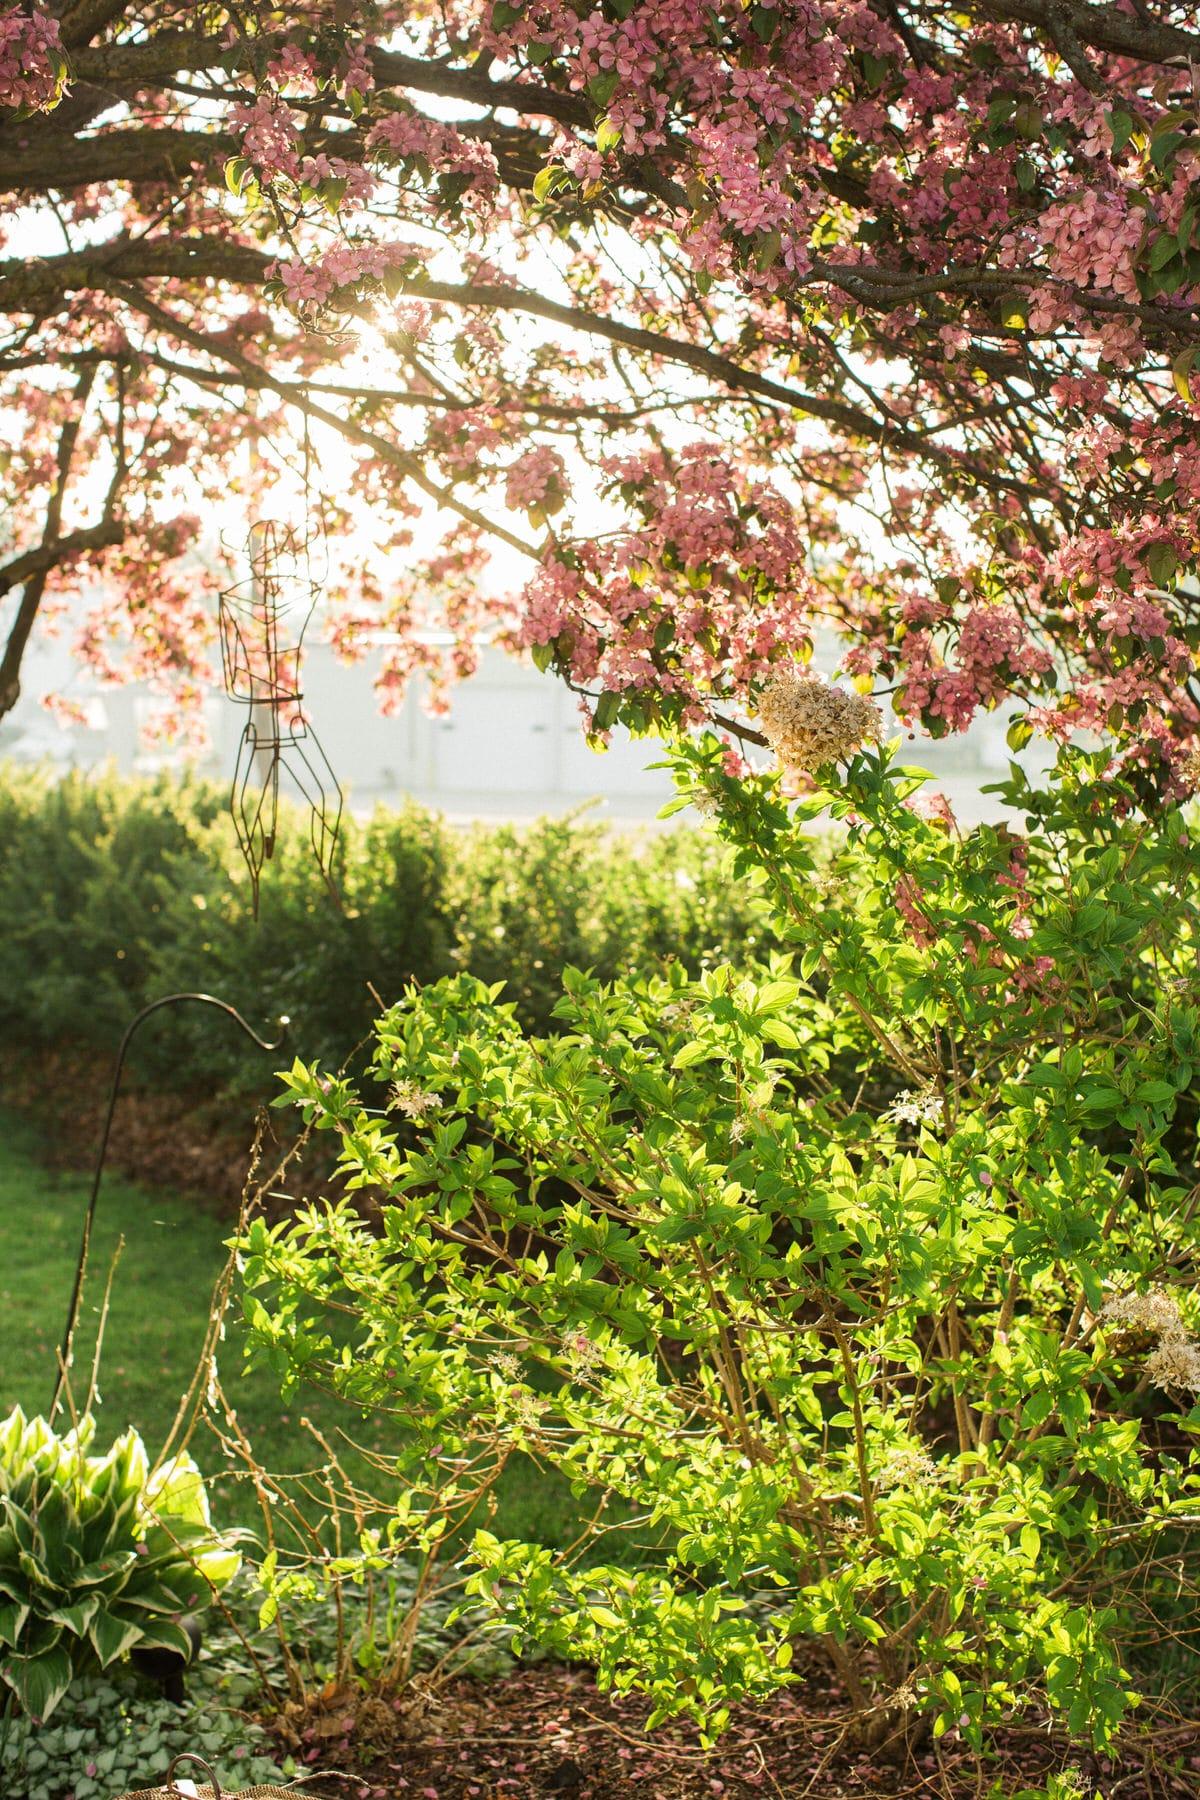 spring-bloom-Wisconsin-fine-art-photography-by-Studio-L-photographer-Laura-Schneider-_5570